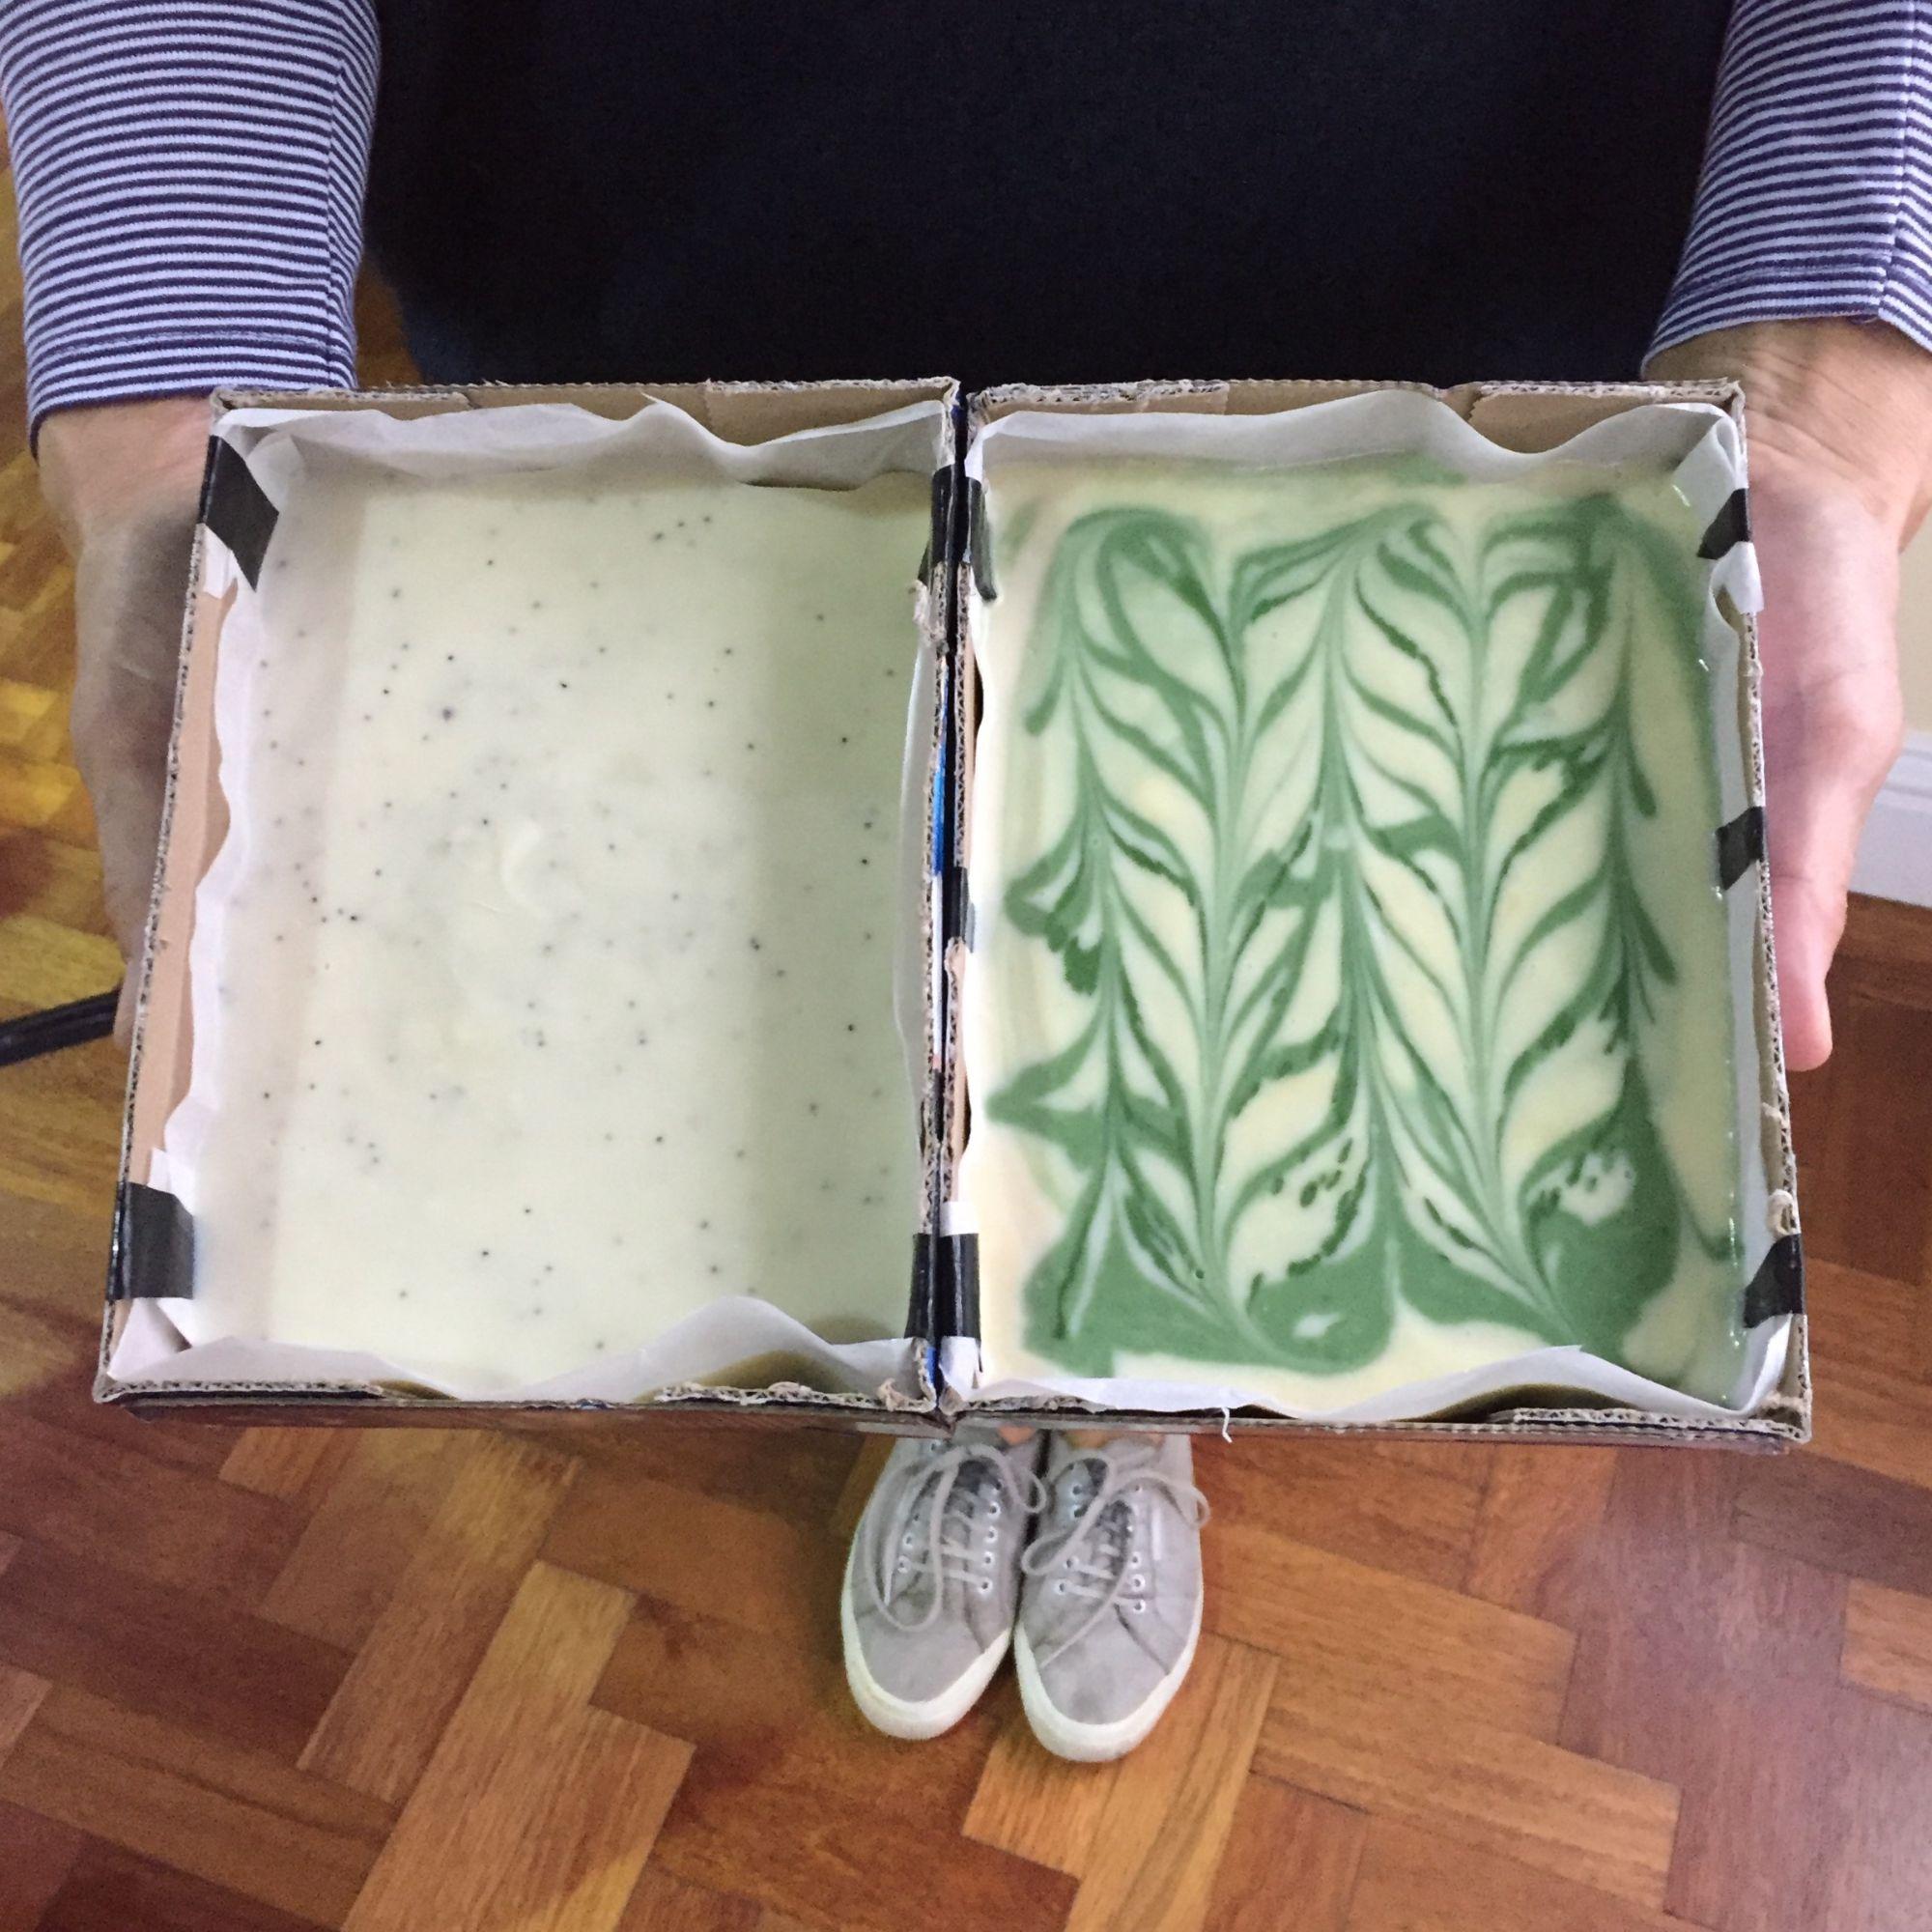 Soap Making Workshop - Batches